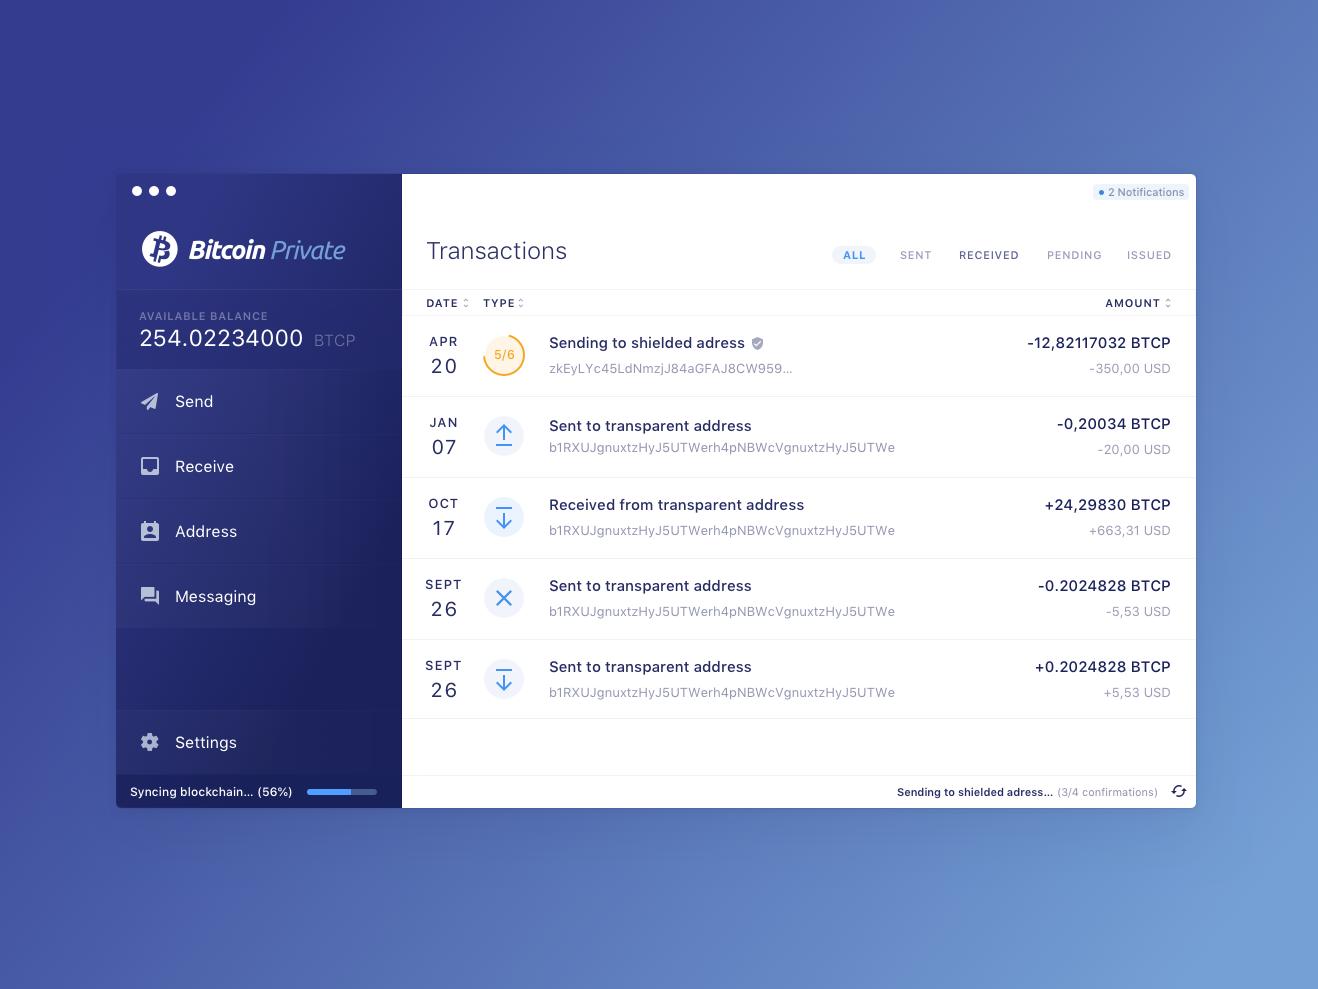 Bitcoin Private Wallet 8px grid typescale application desktop money bitcoin wallet crypto